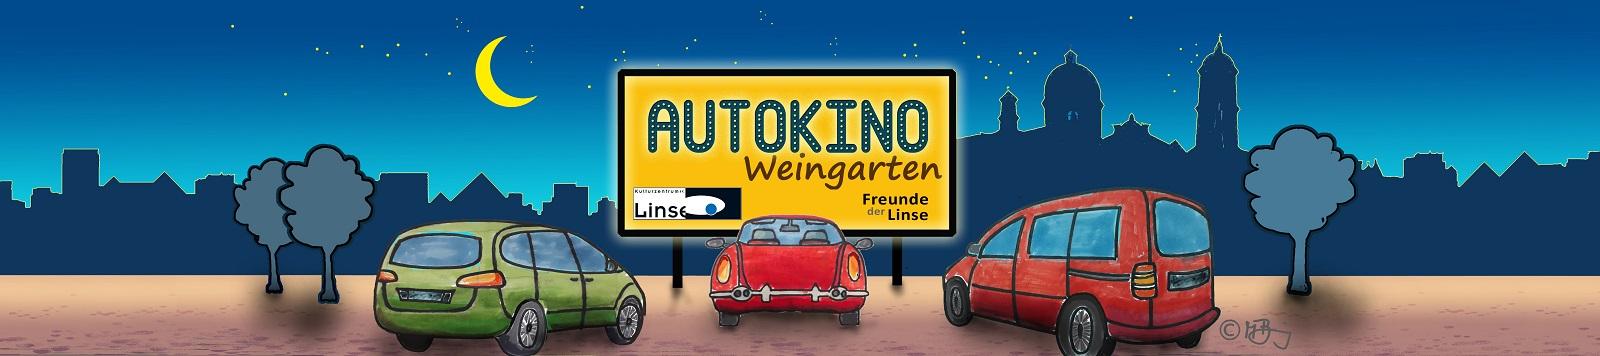 Autokino Weingarten (bei Ravensburg)